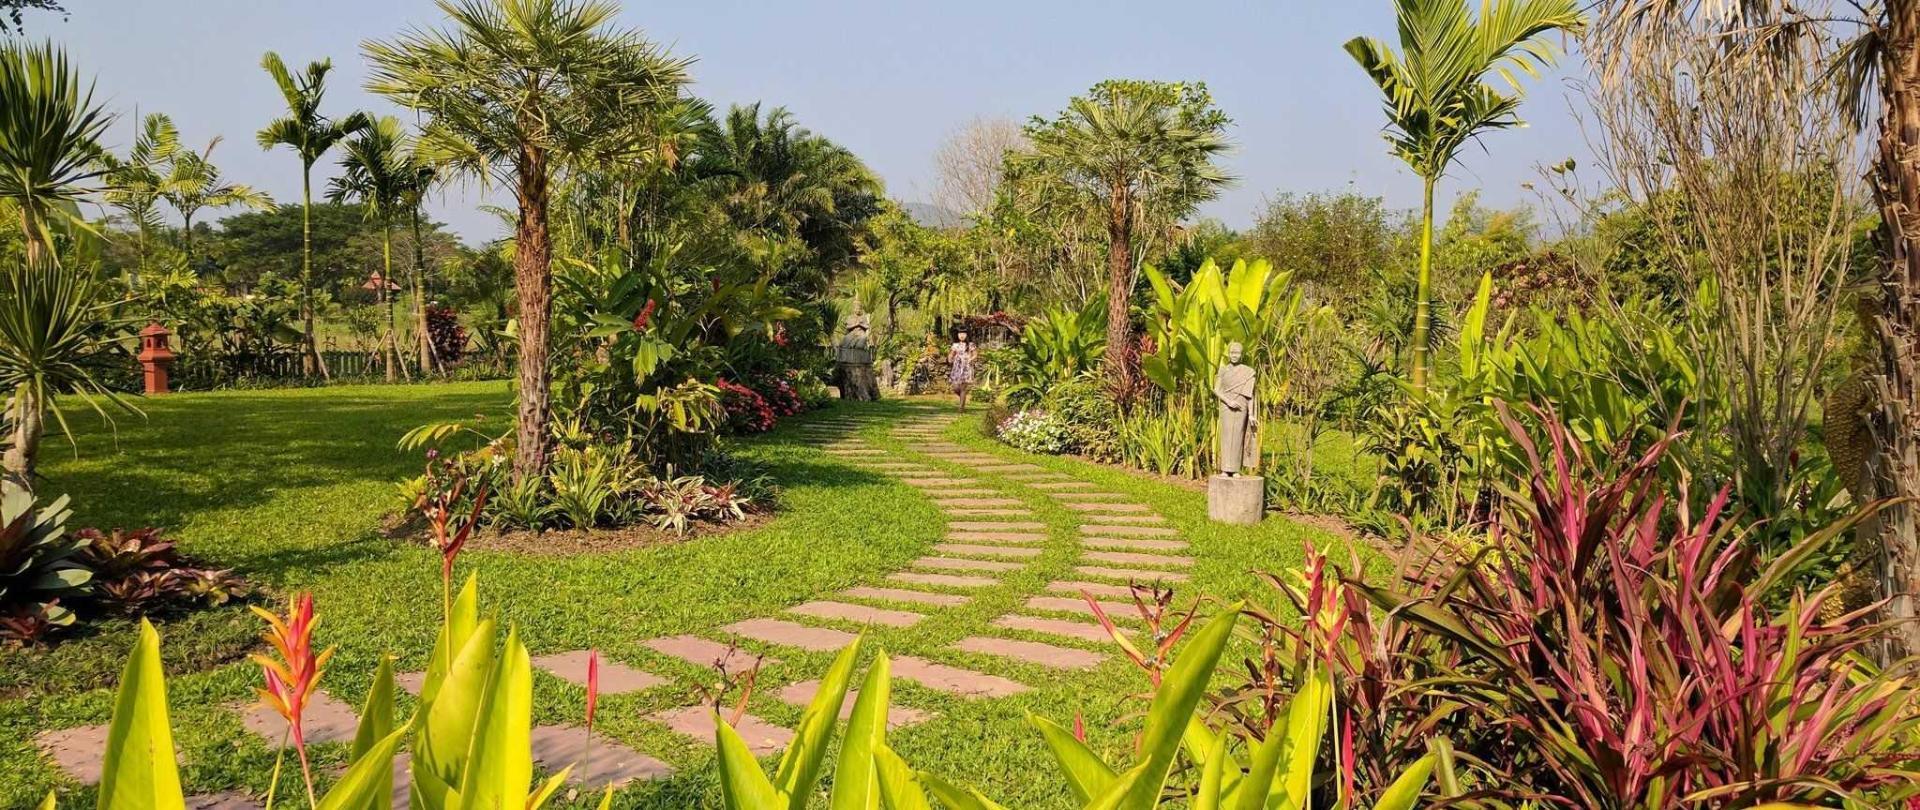 echo-in-the-garden.jpg